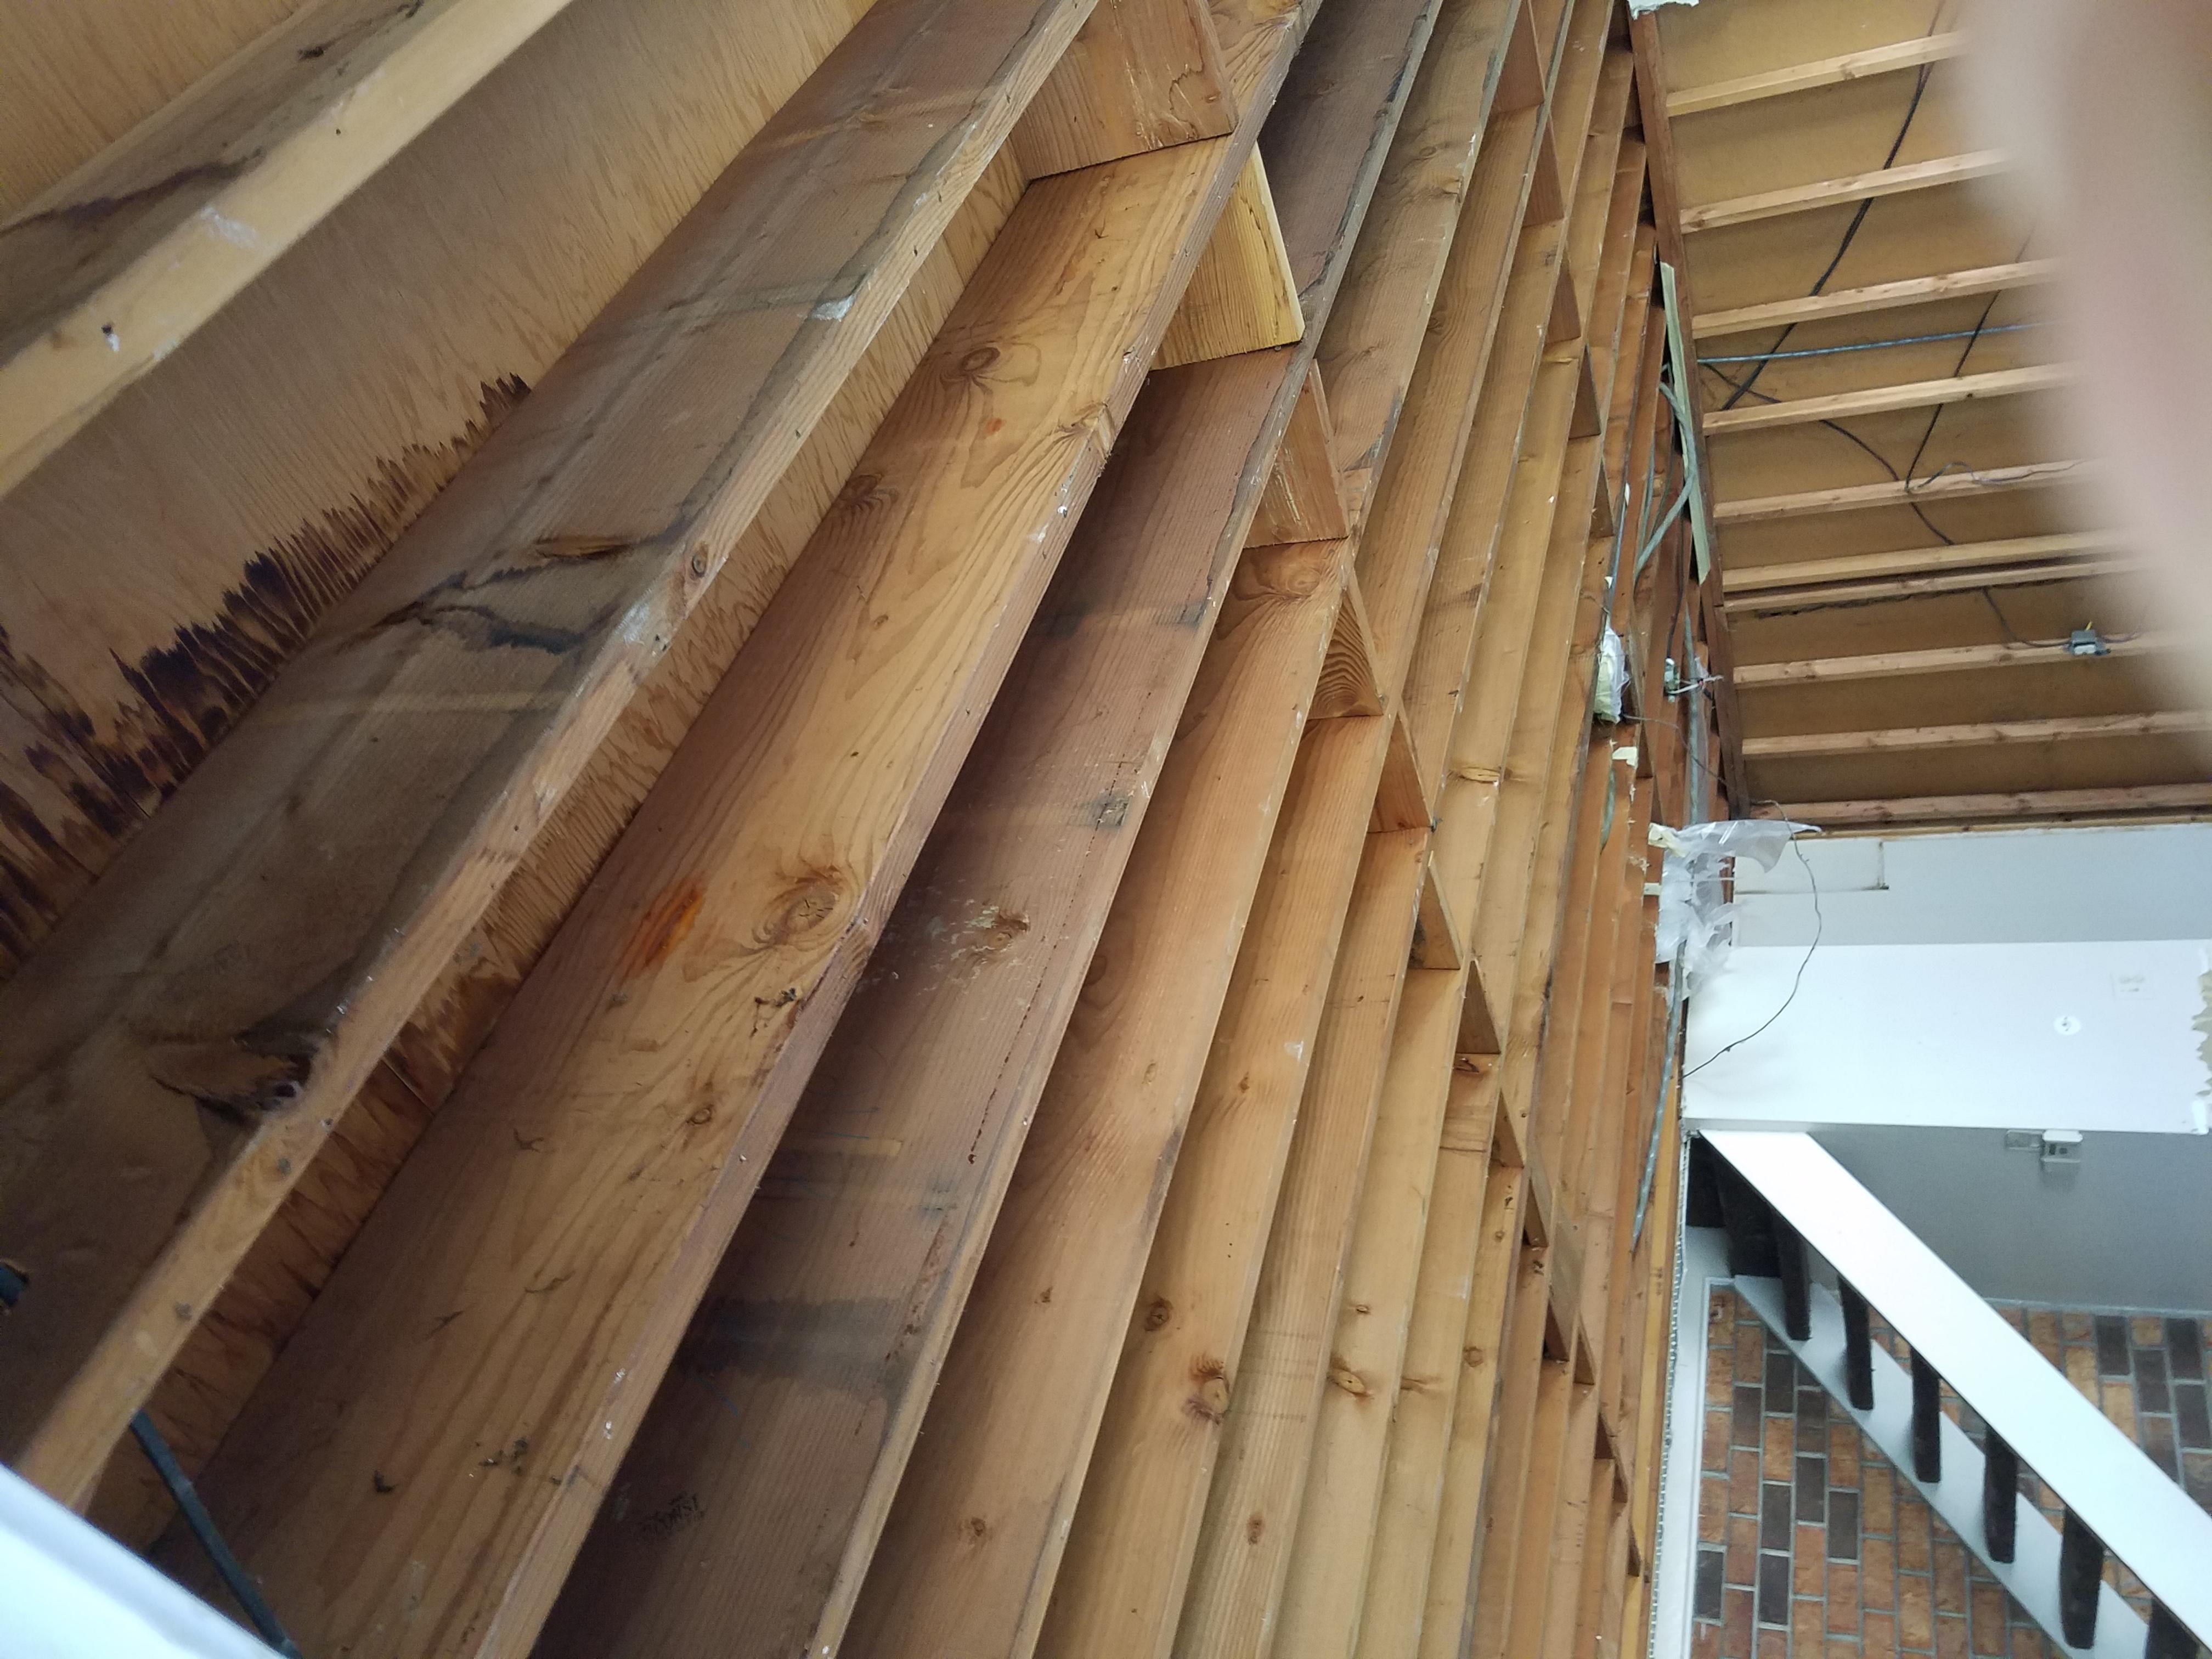 Insulation between floors (Should i insulate?)-20170815_143613.jpg